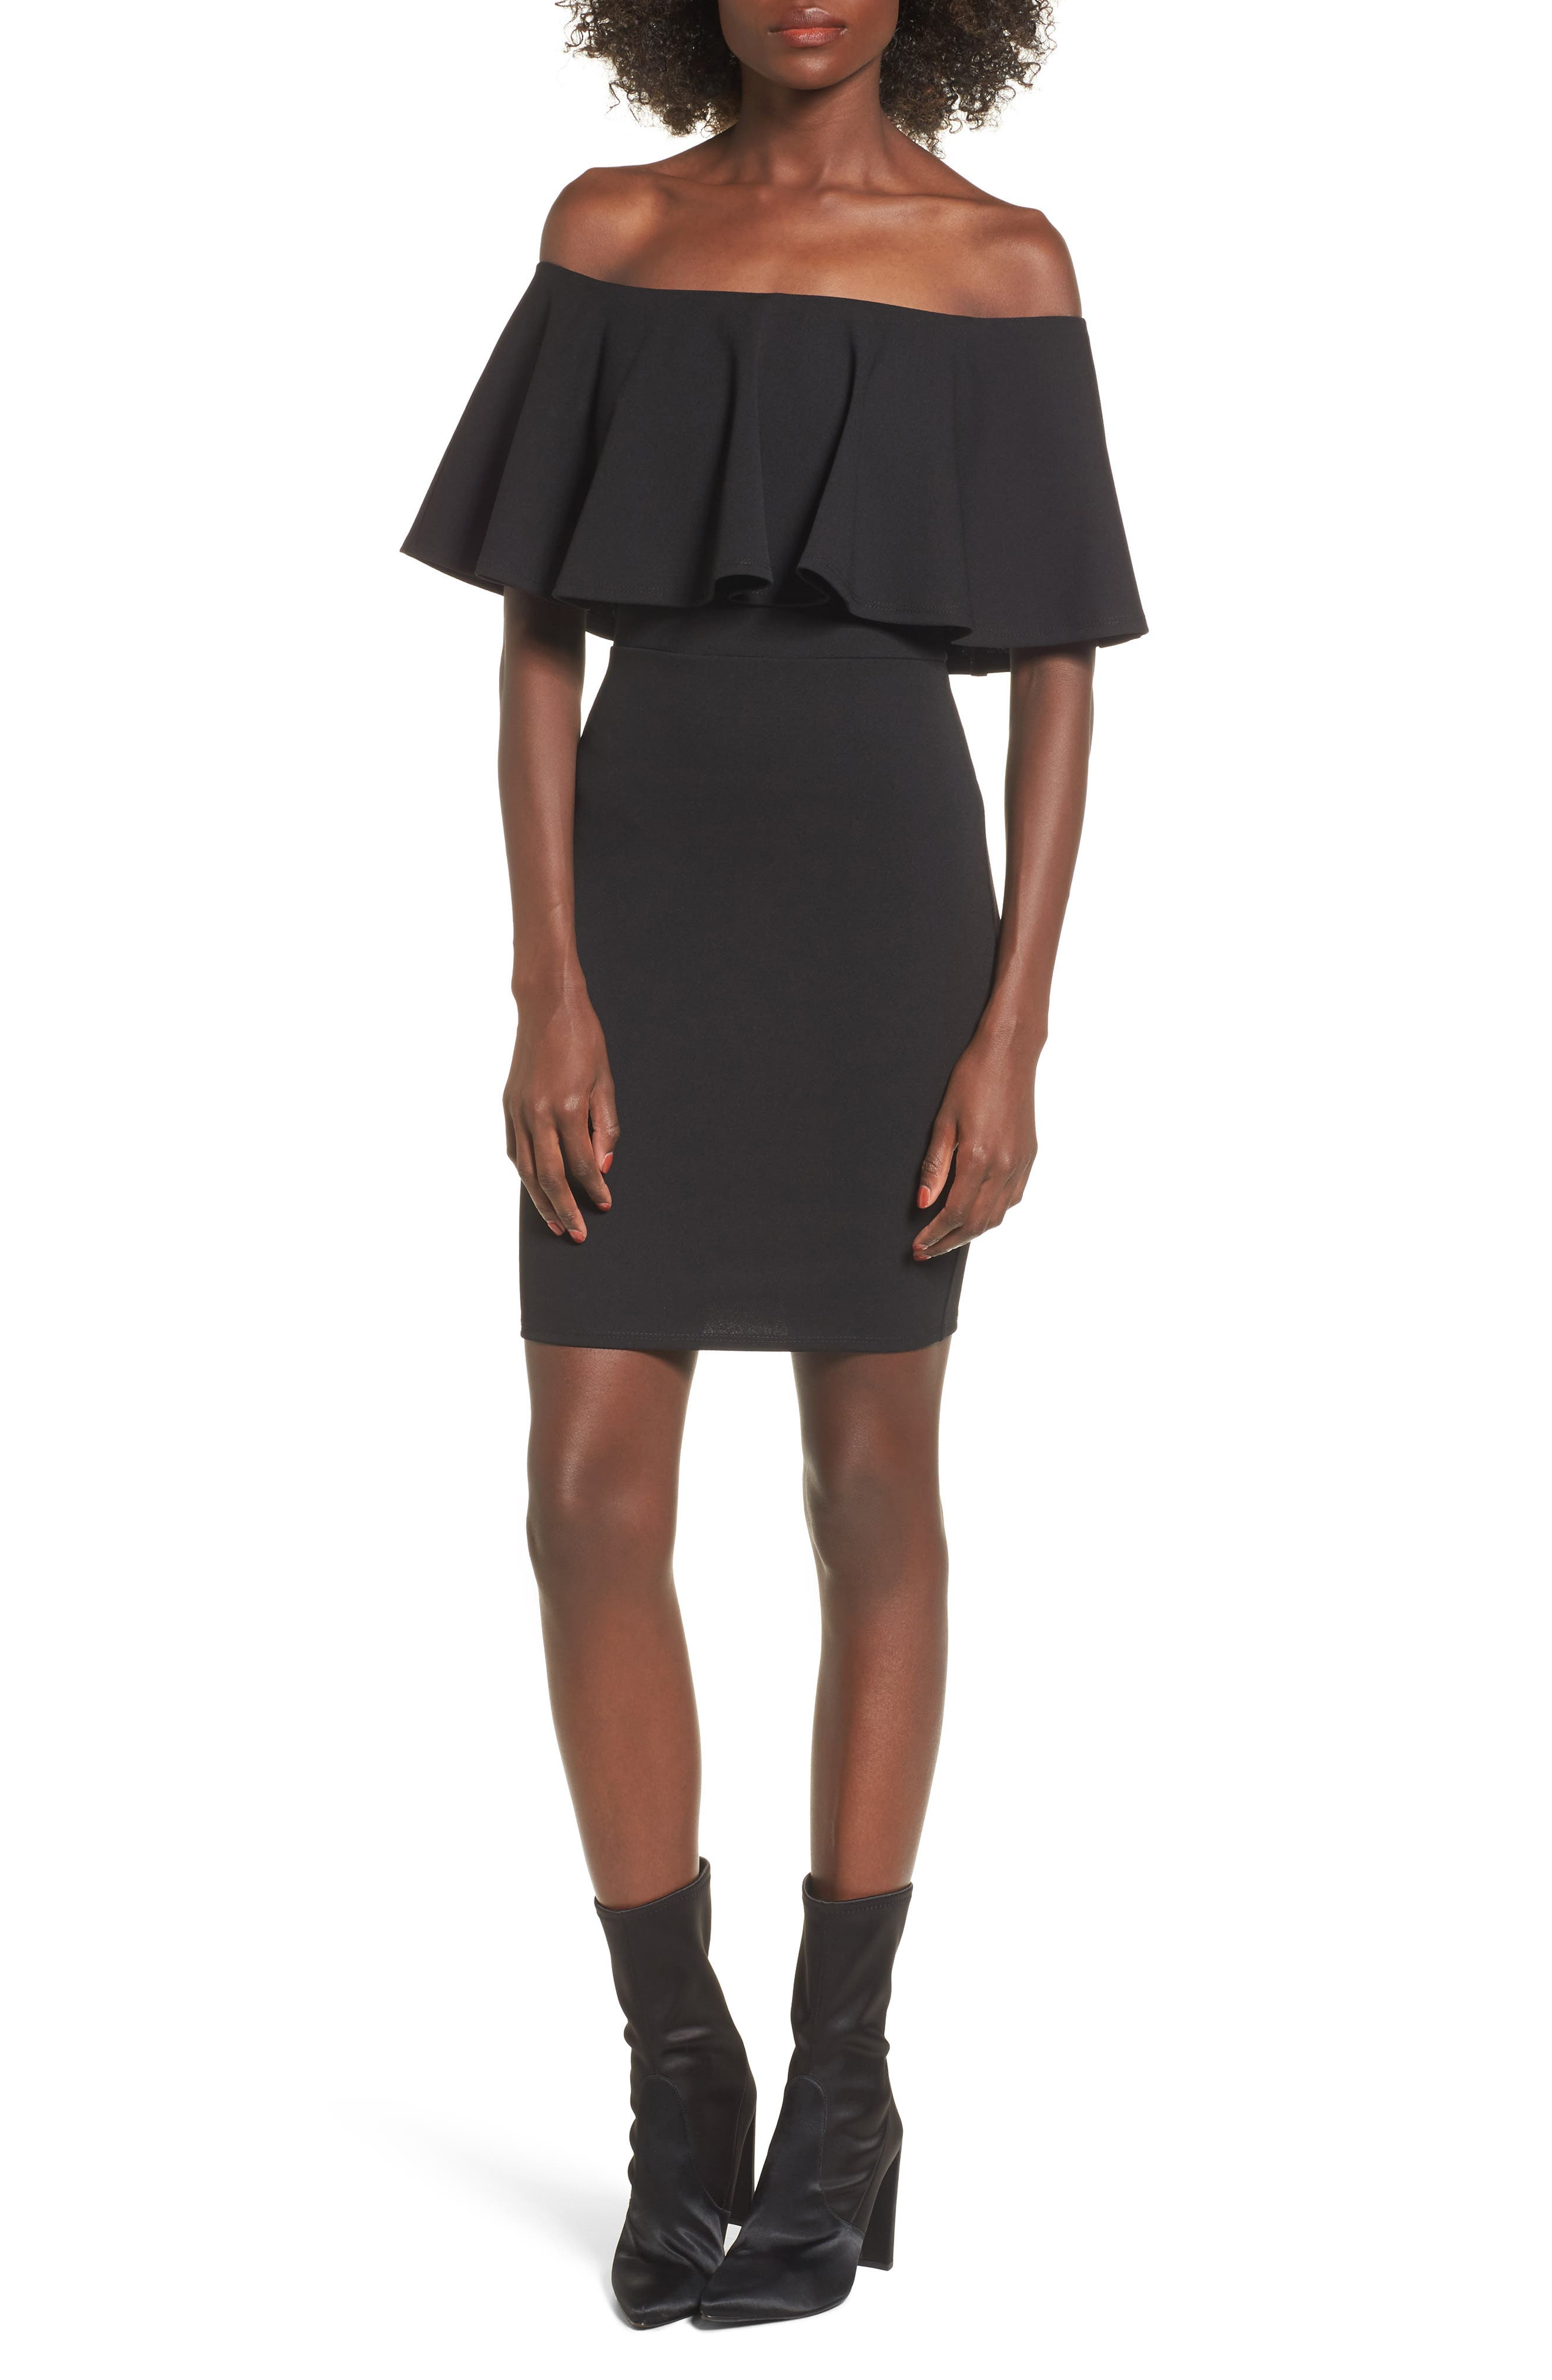 SOPRANO, Ruffle Off the Shoulder Body-Con Dress, Main thumbnail 1, color, 001